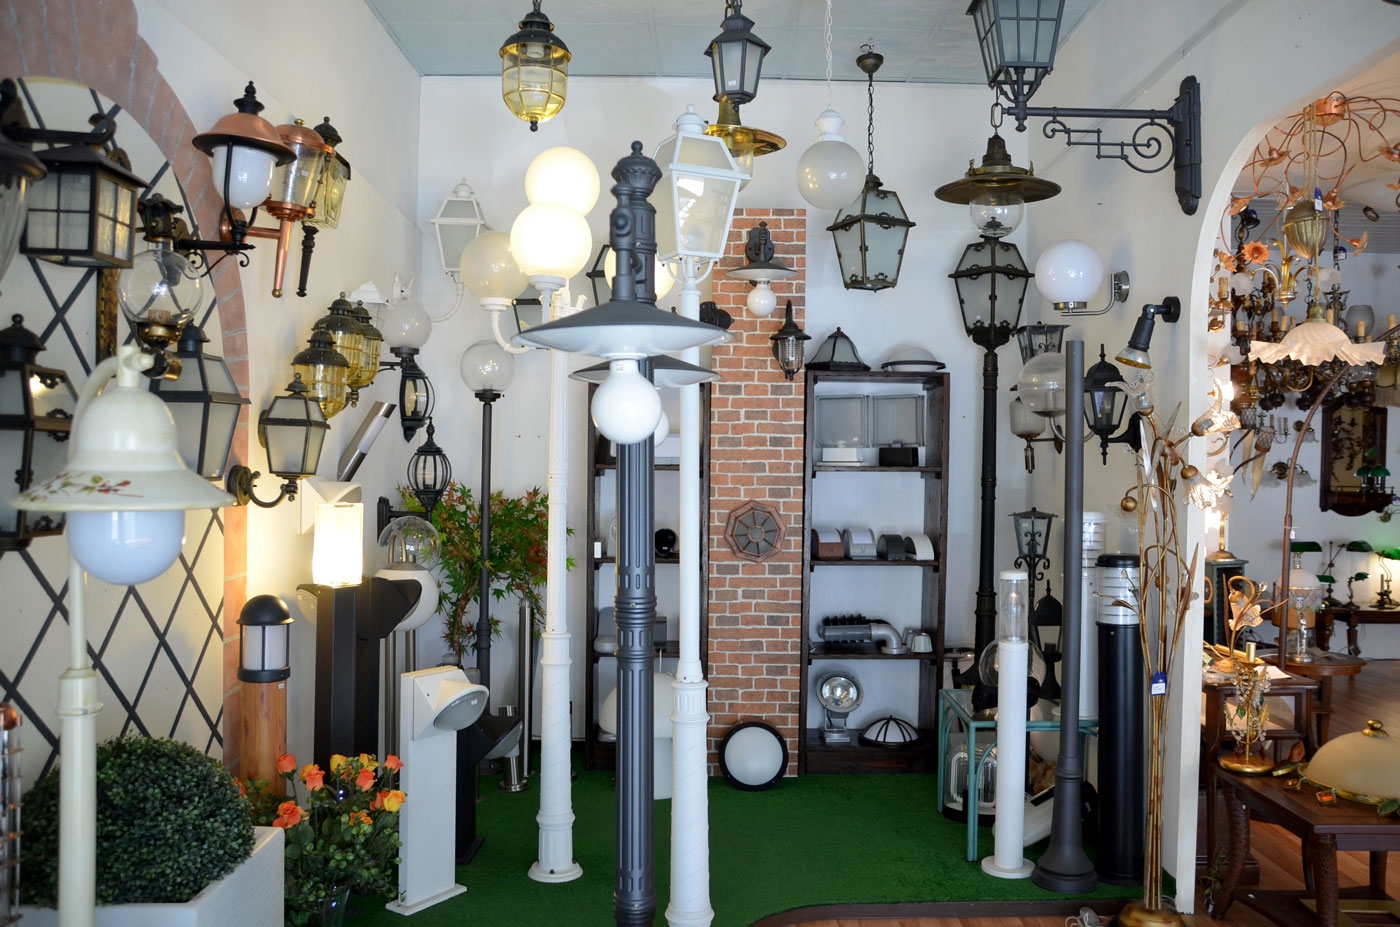 Vendita lampadari luci illuminazione esterni giardini lampioni luce